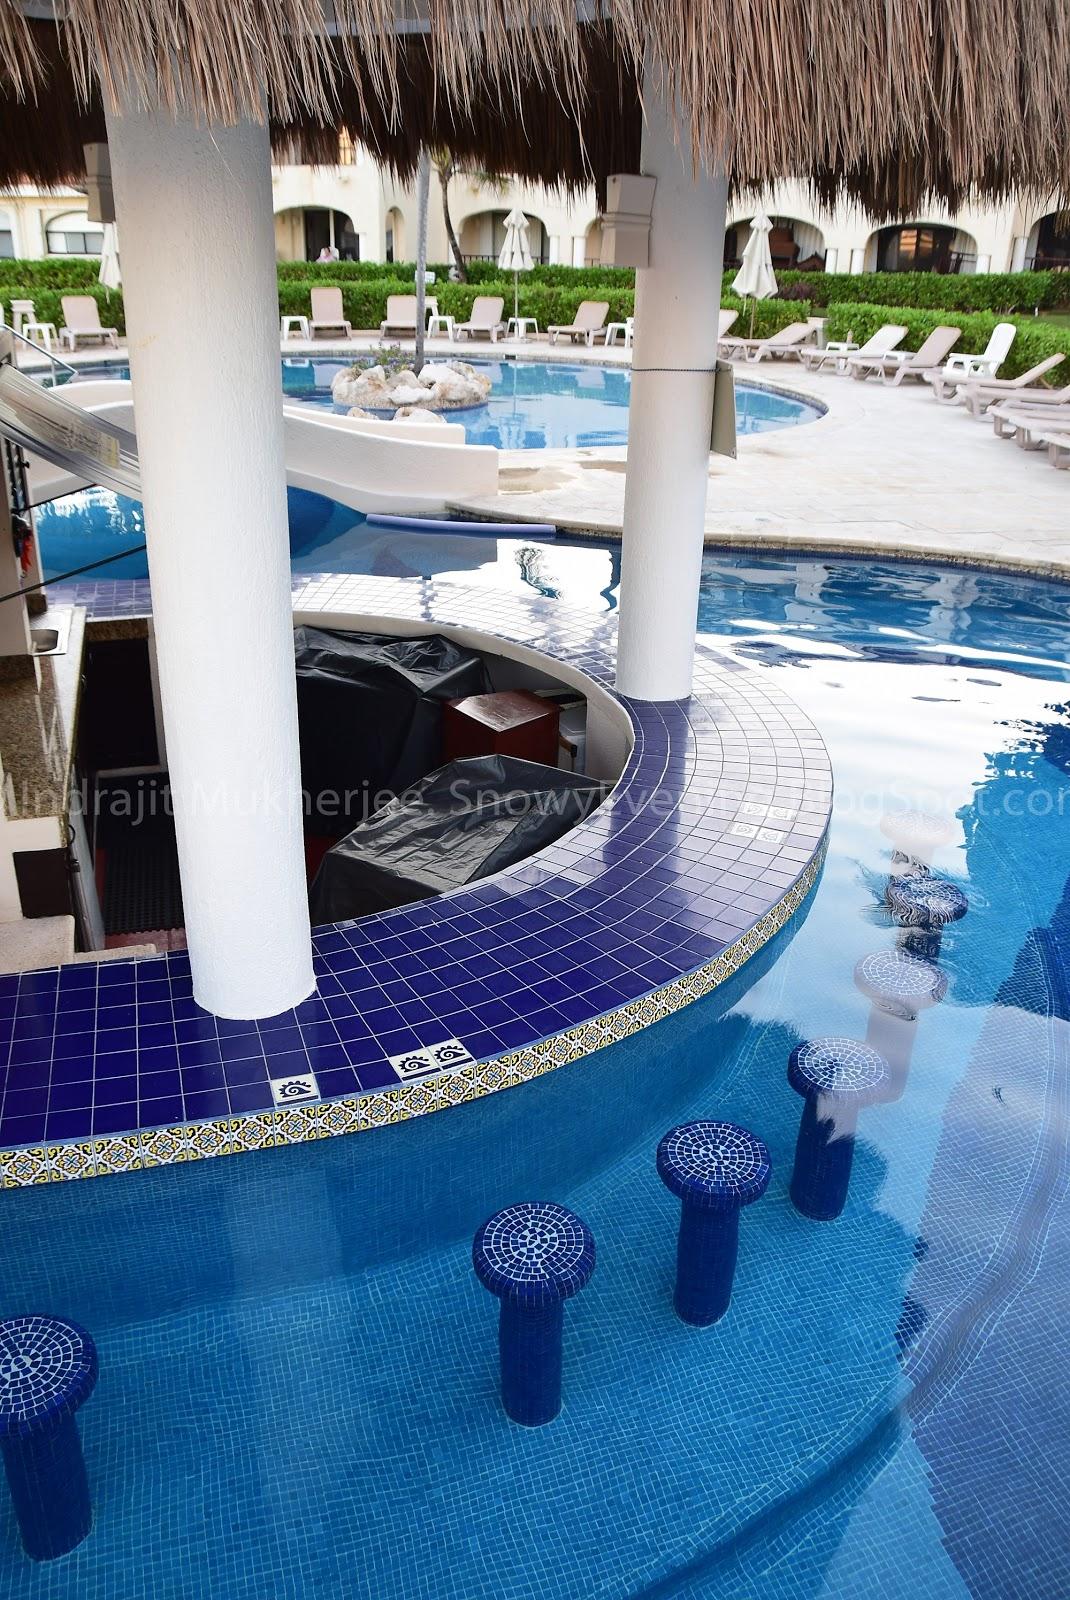 Yucatan Peninsula 2: Xaman Ha   Where We Stayed